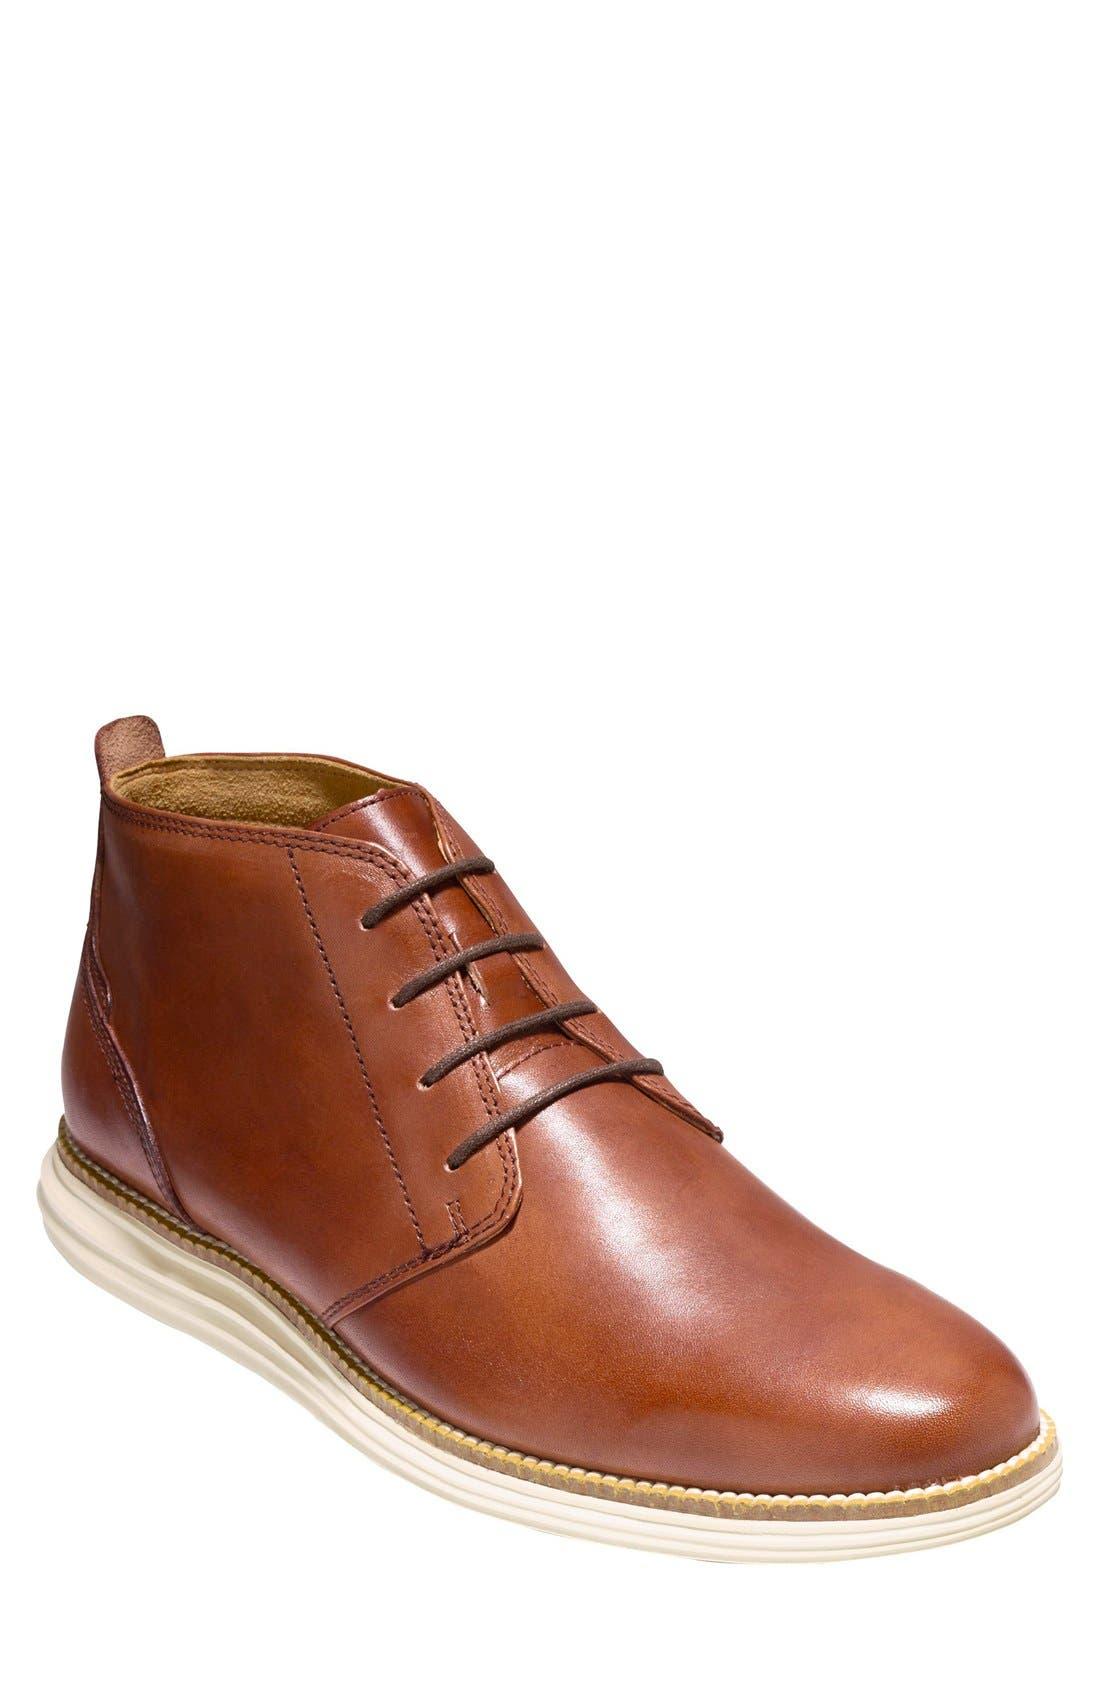 Main Image - Cole Haan 'Original Grand' Chukka Boot (Men)